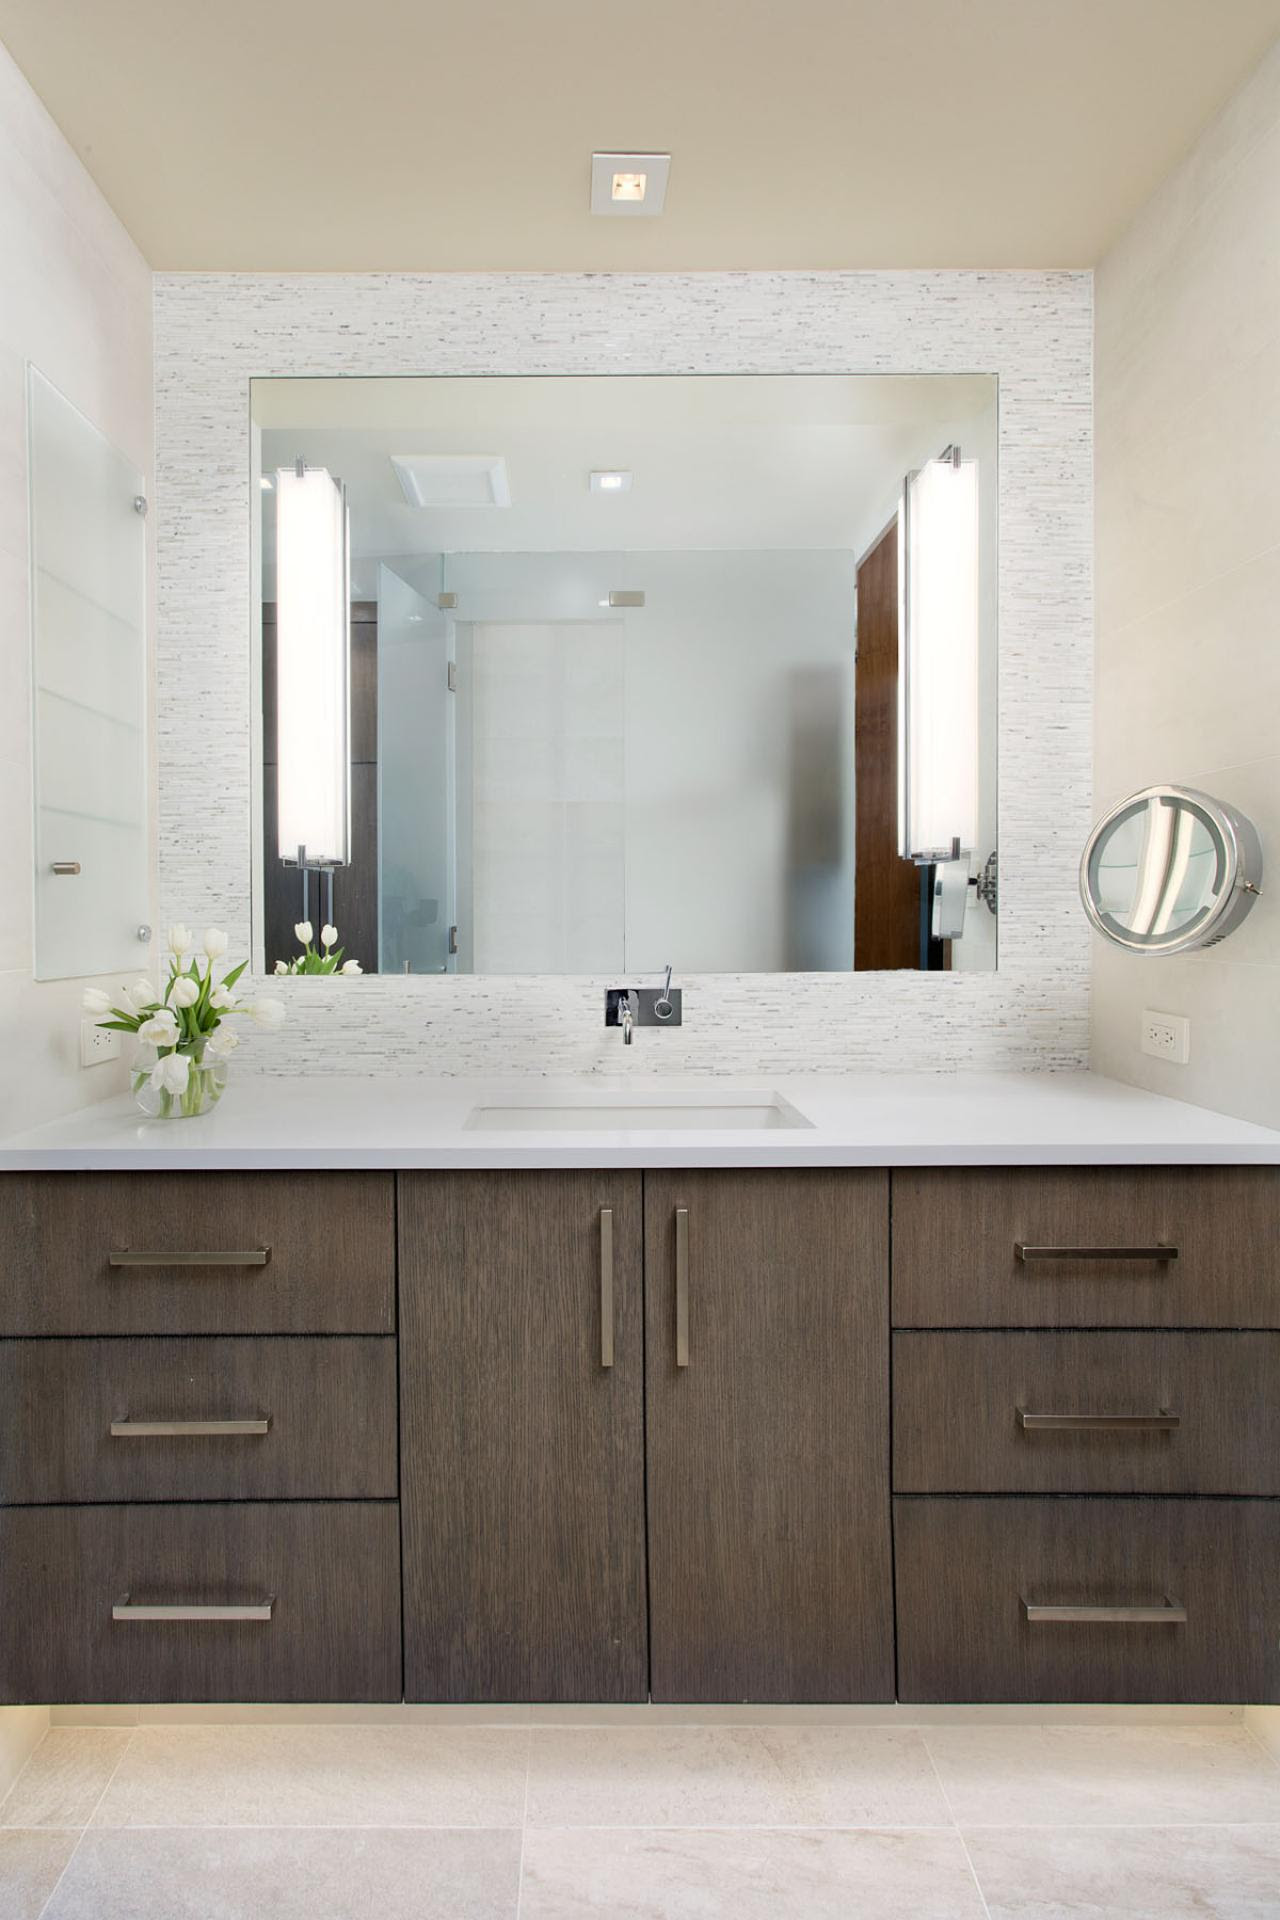 White Bathroom Decor Ideas: Pictures & Tips From HGTV | HGTV